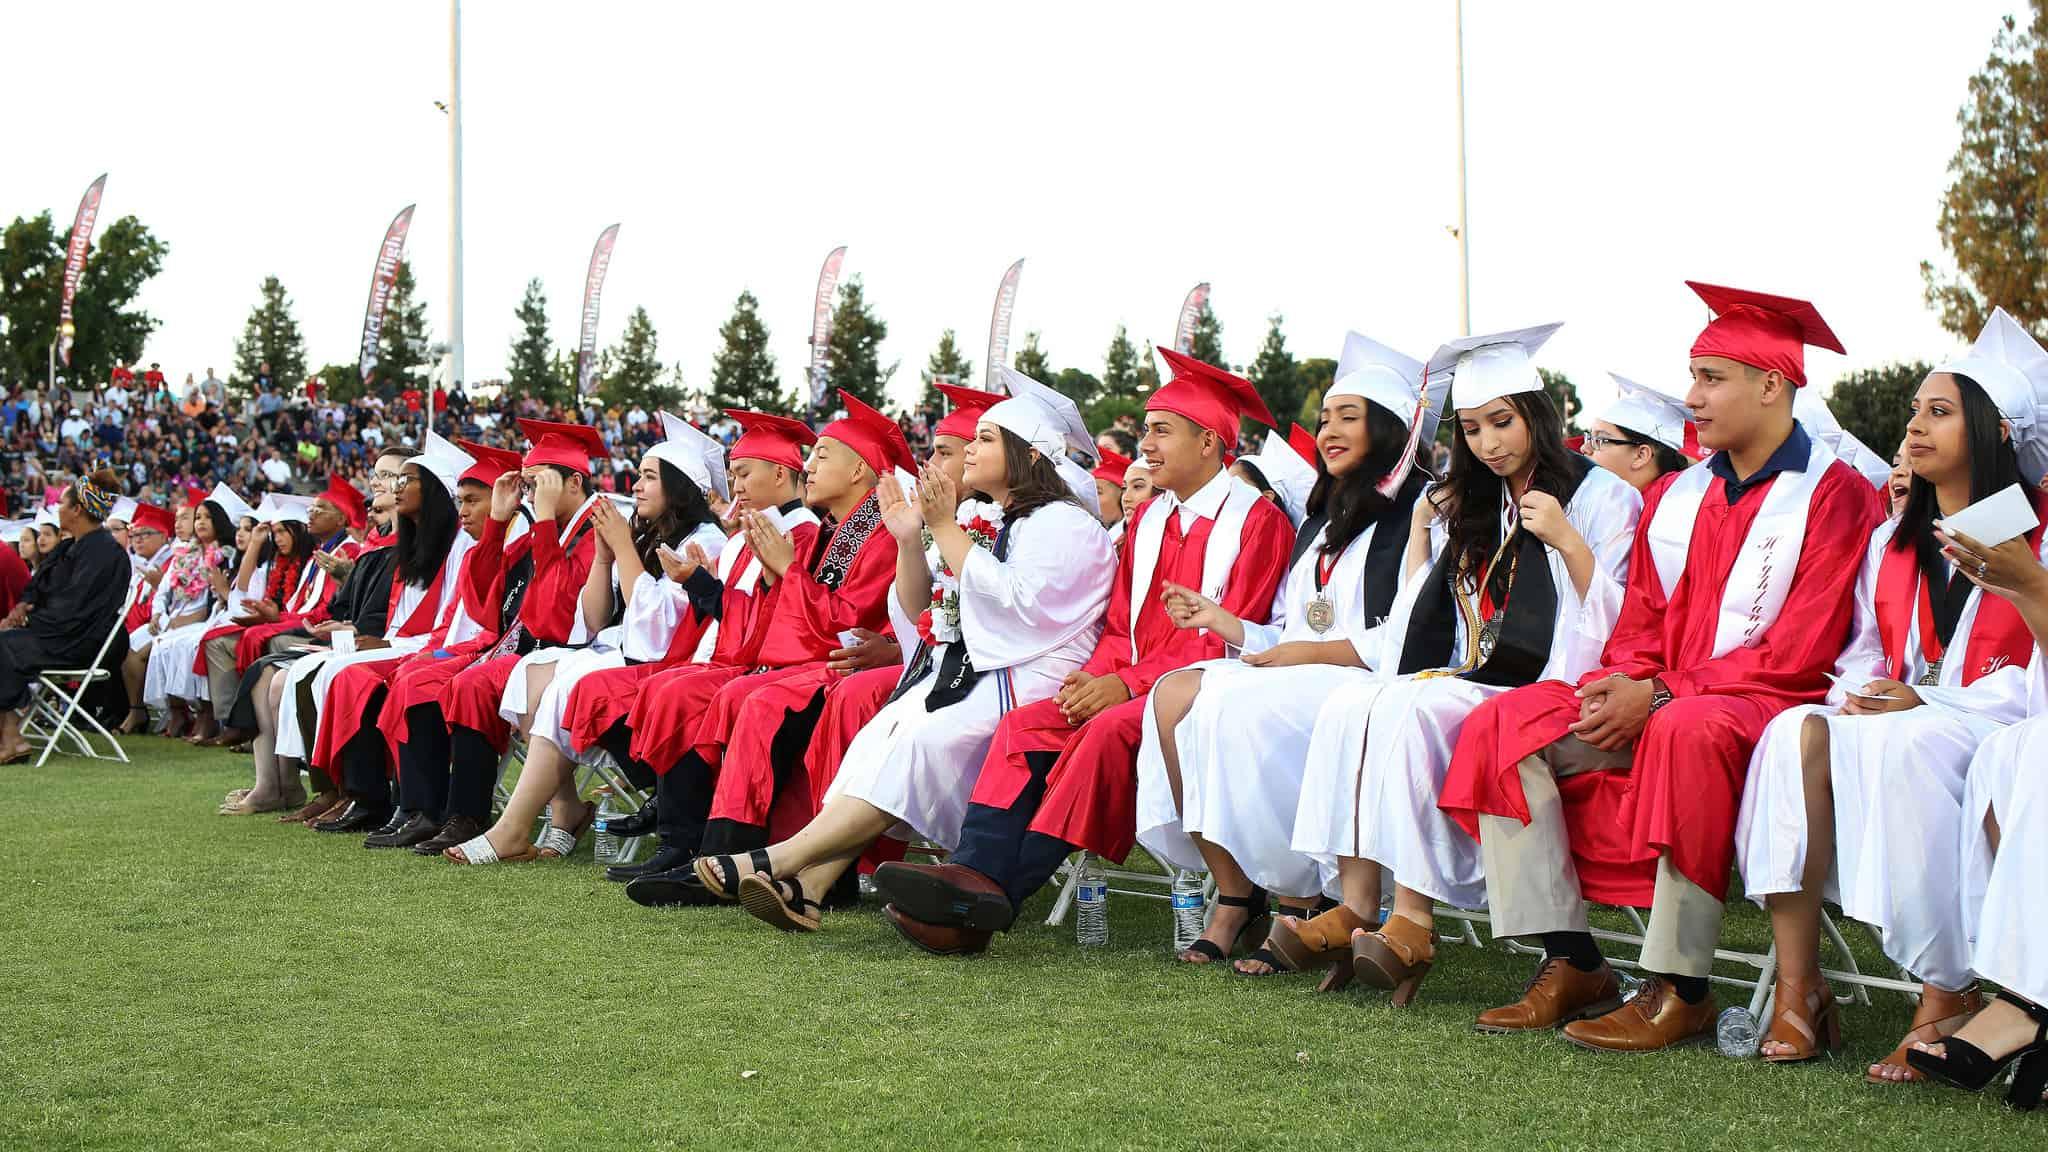 McLane graduates